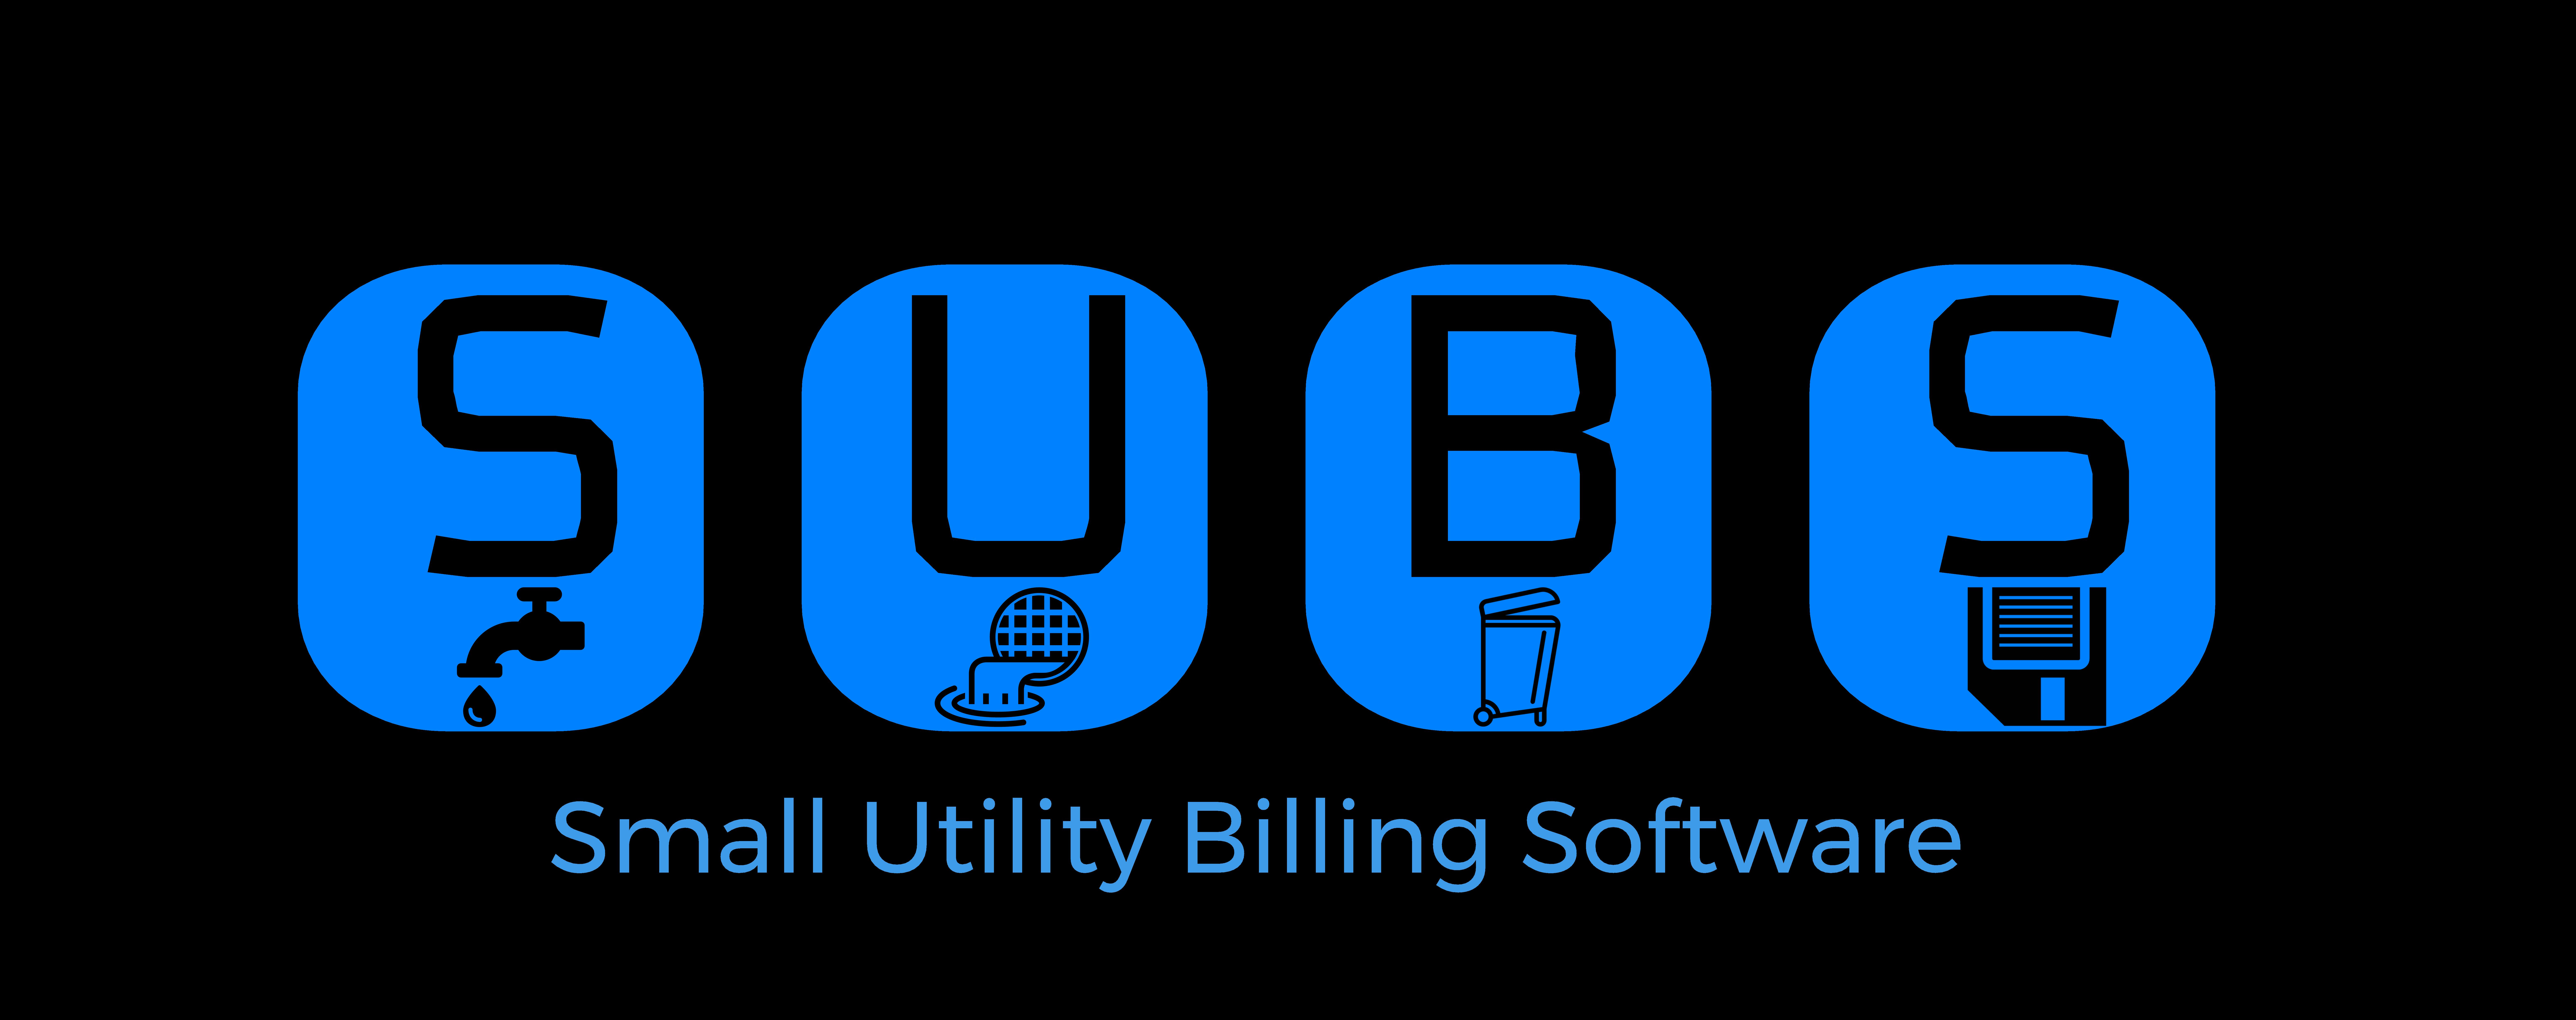 s u b s small utility billing software